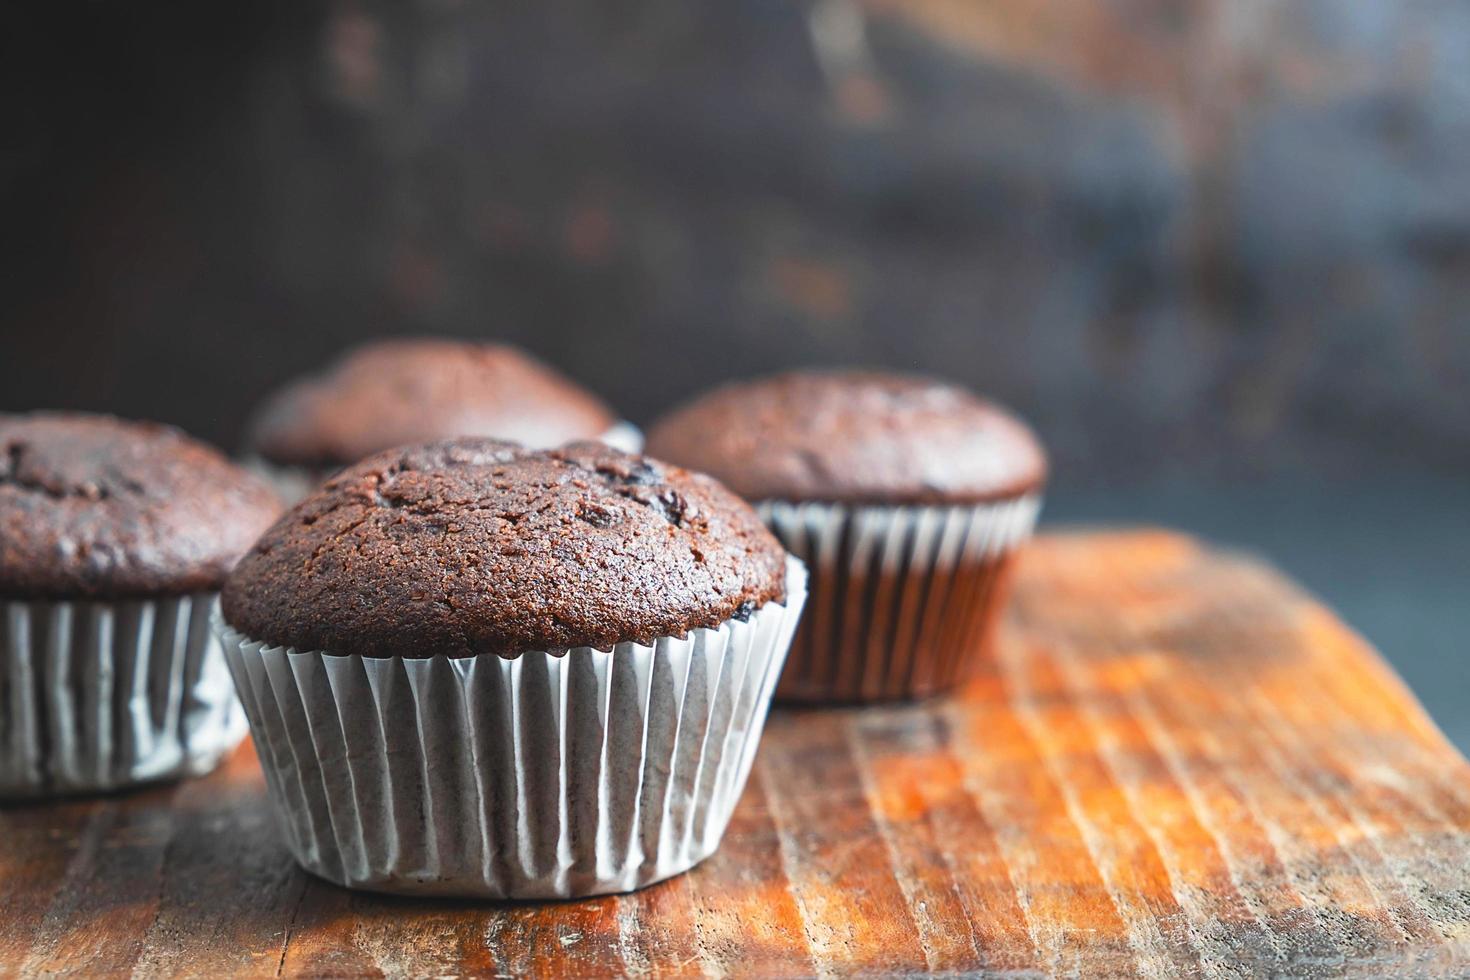 chocolade cupcakes op houten achtergrond foto